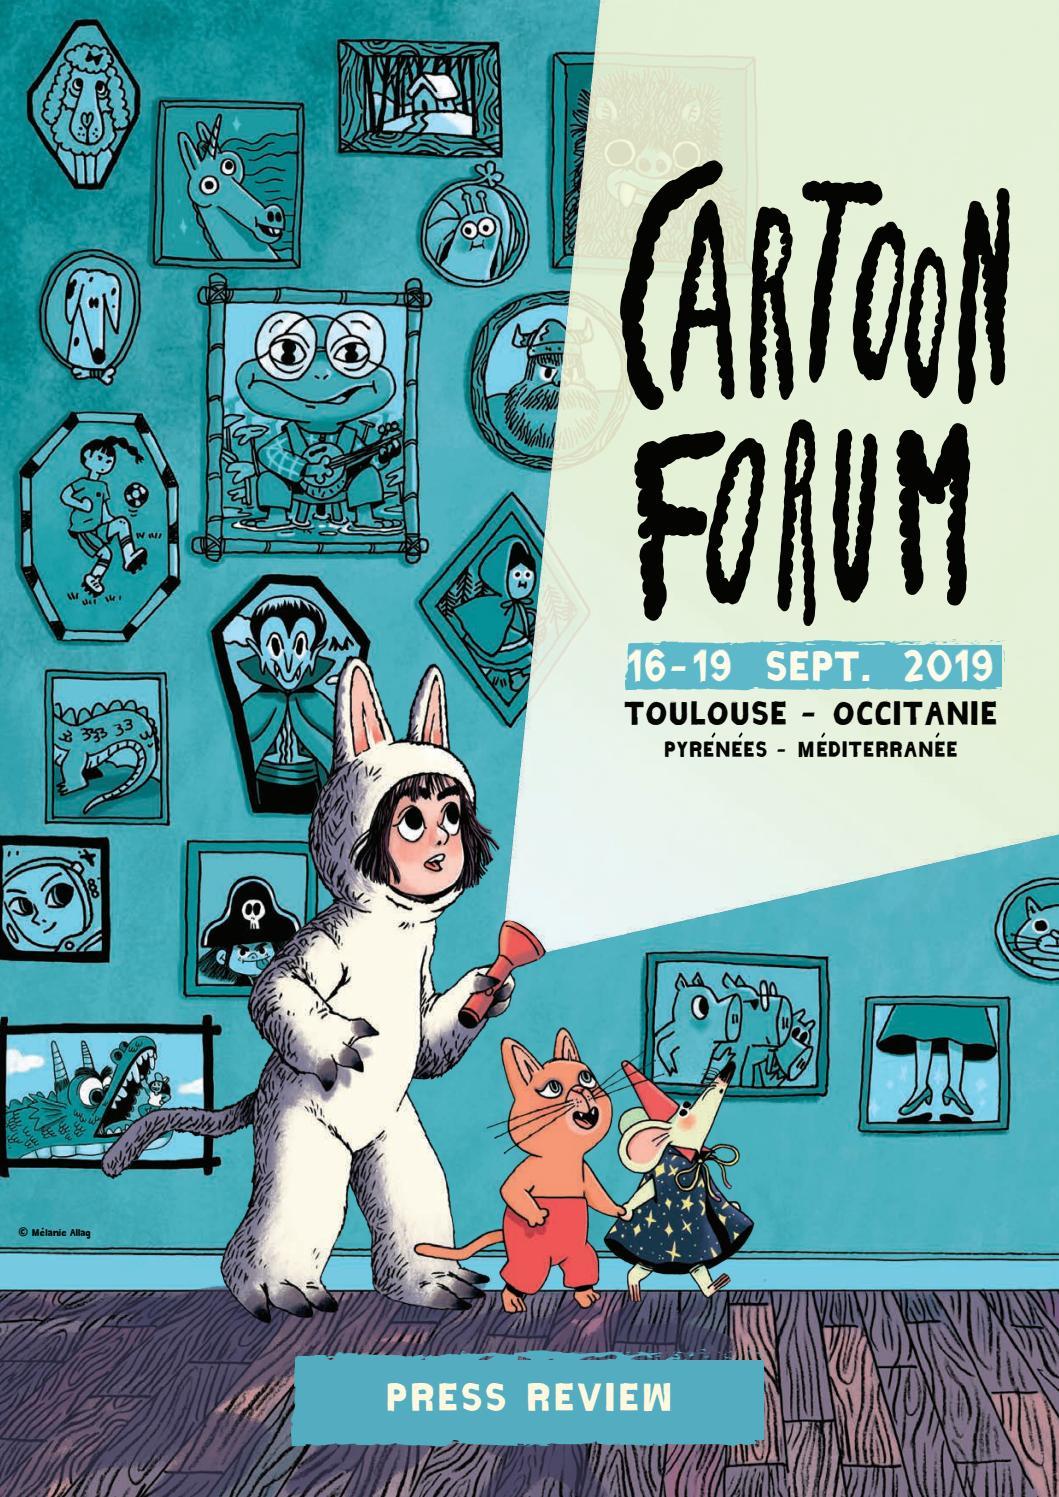 Cartoon Forum 2019 Press Review By Cartoon Issuu